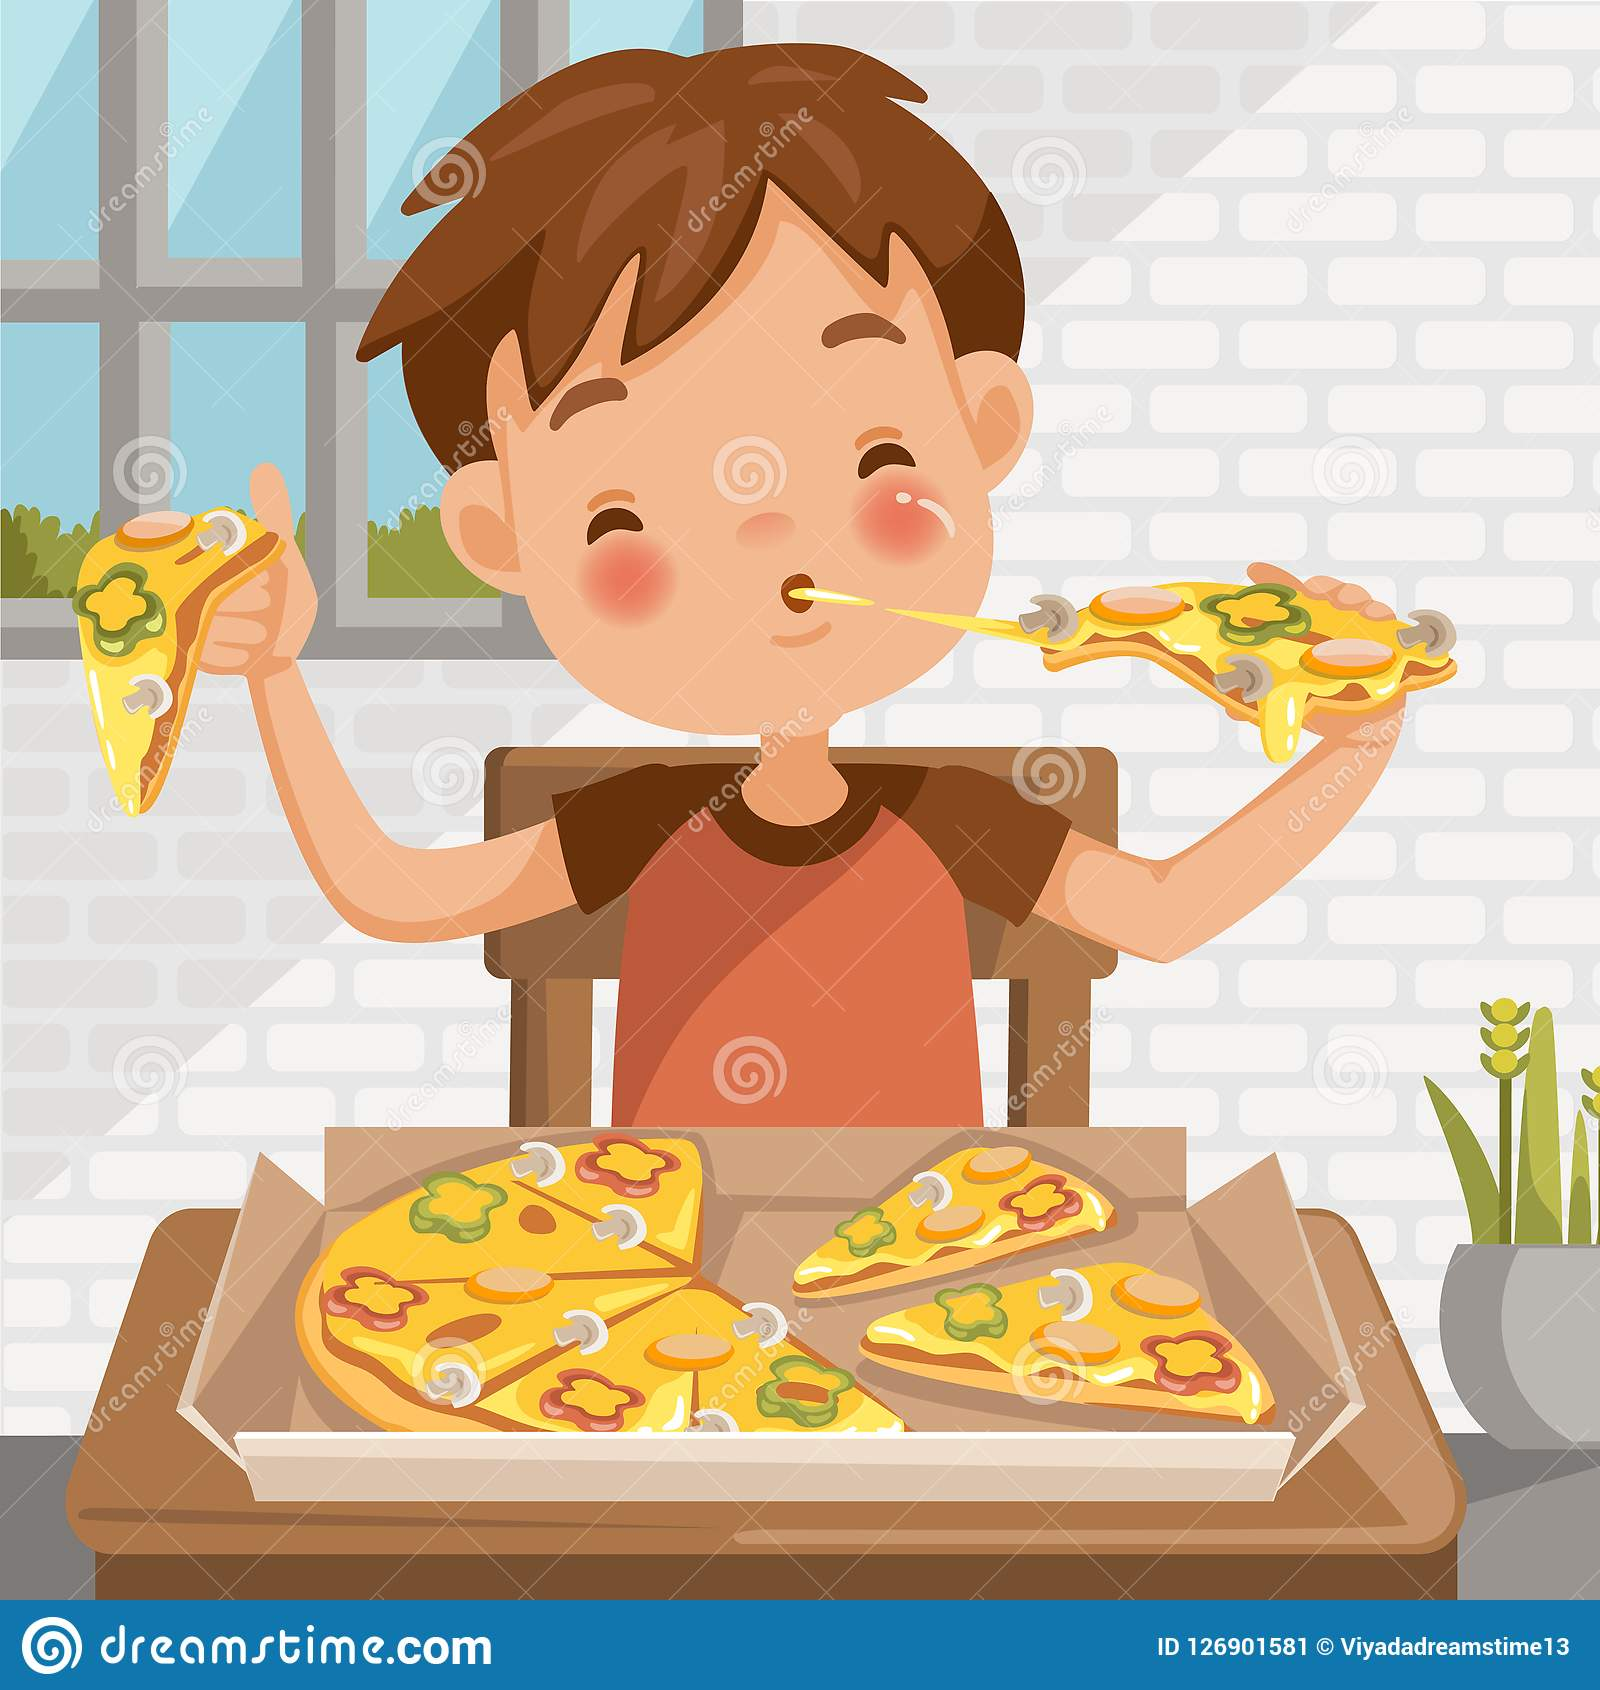 Boy Eating Pizza Stock Illustration. Illustration Of